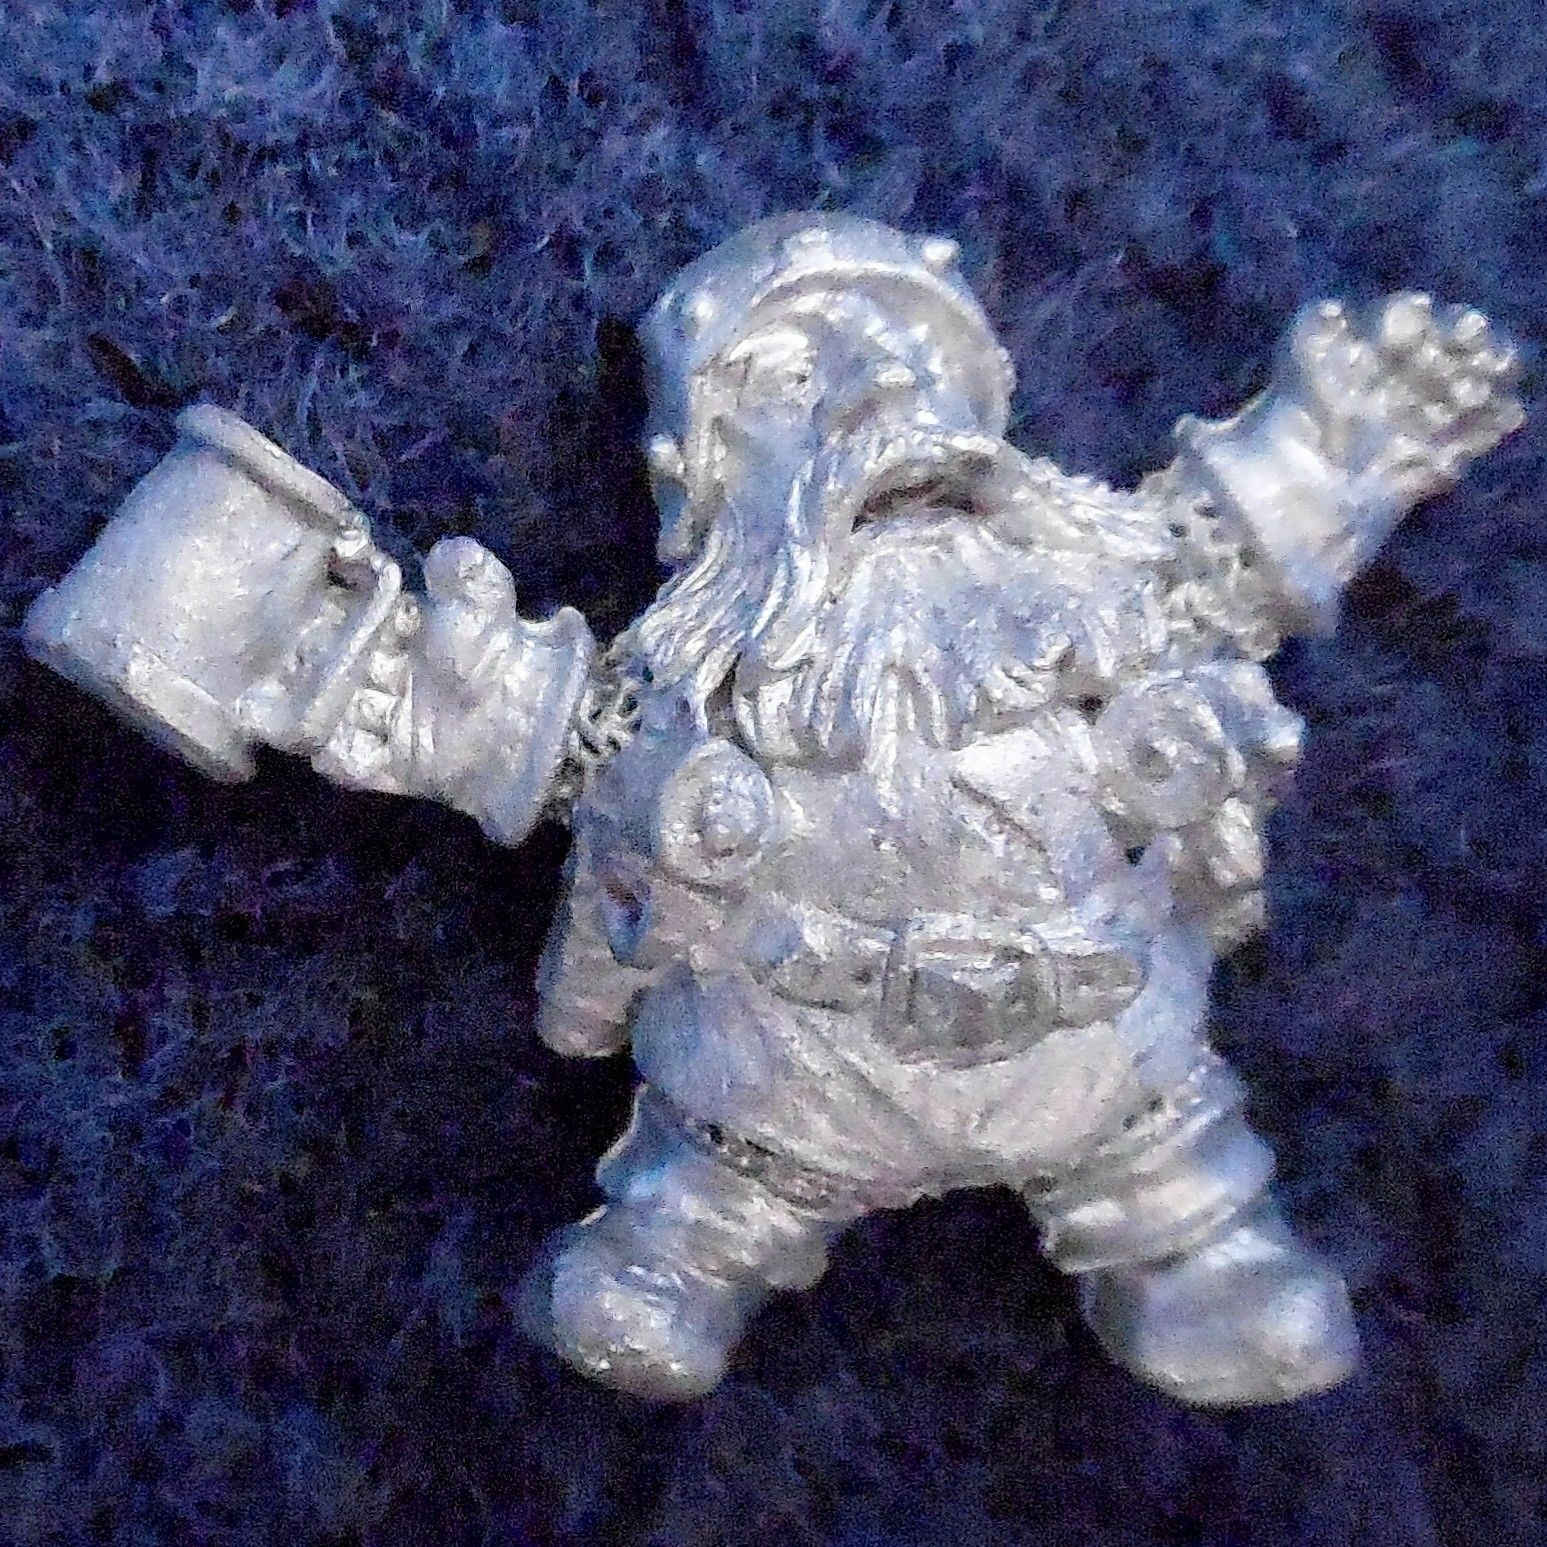 1987 Dwarf Adventurer 0305 15 D4 Casualty Citadel Wounded Warhammer Dead Drunk